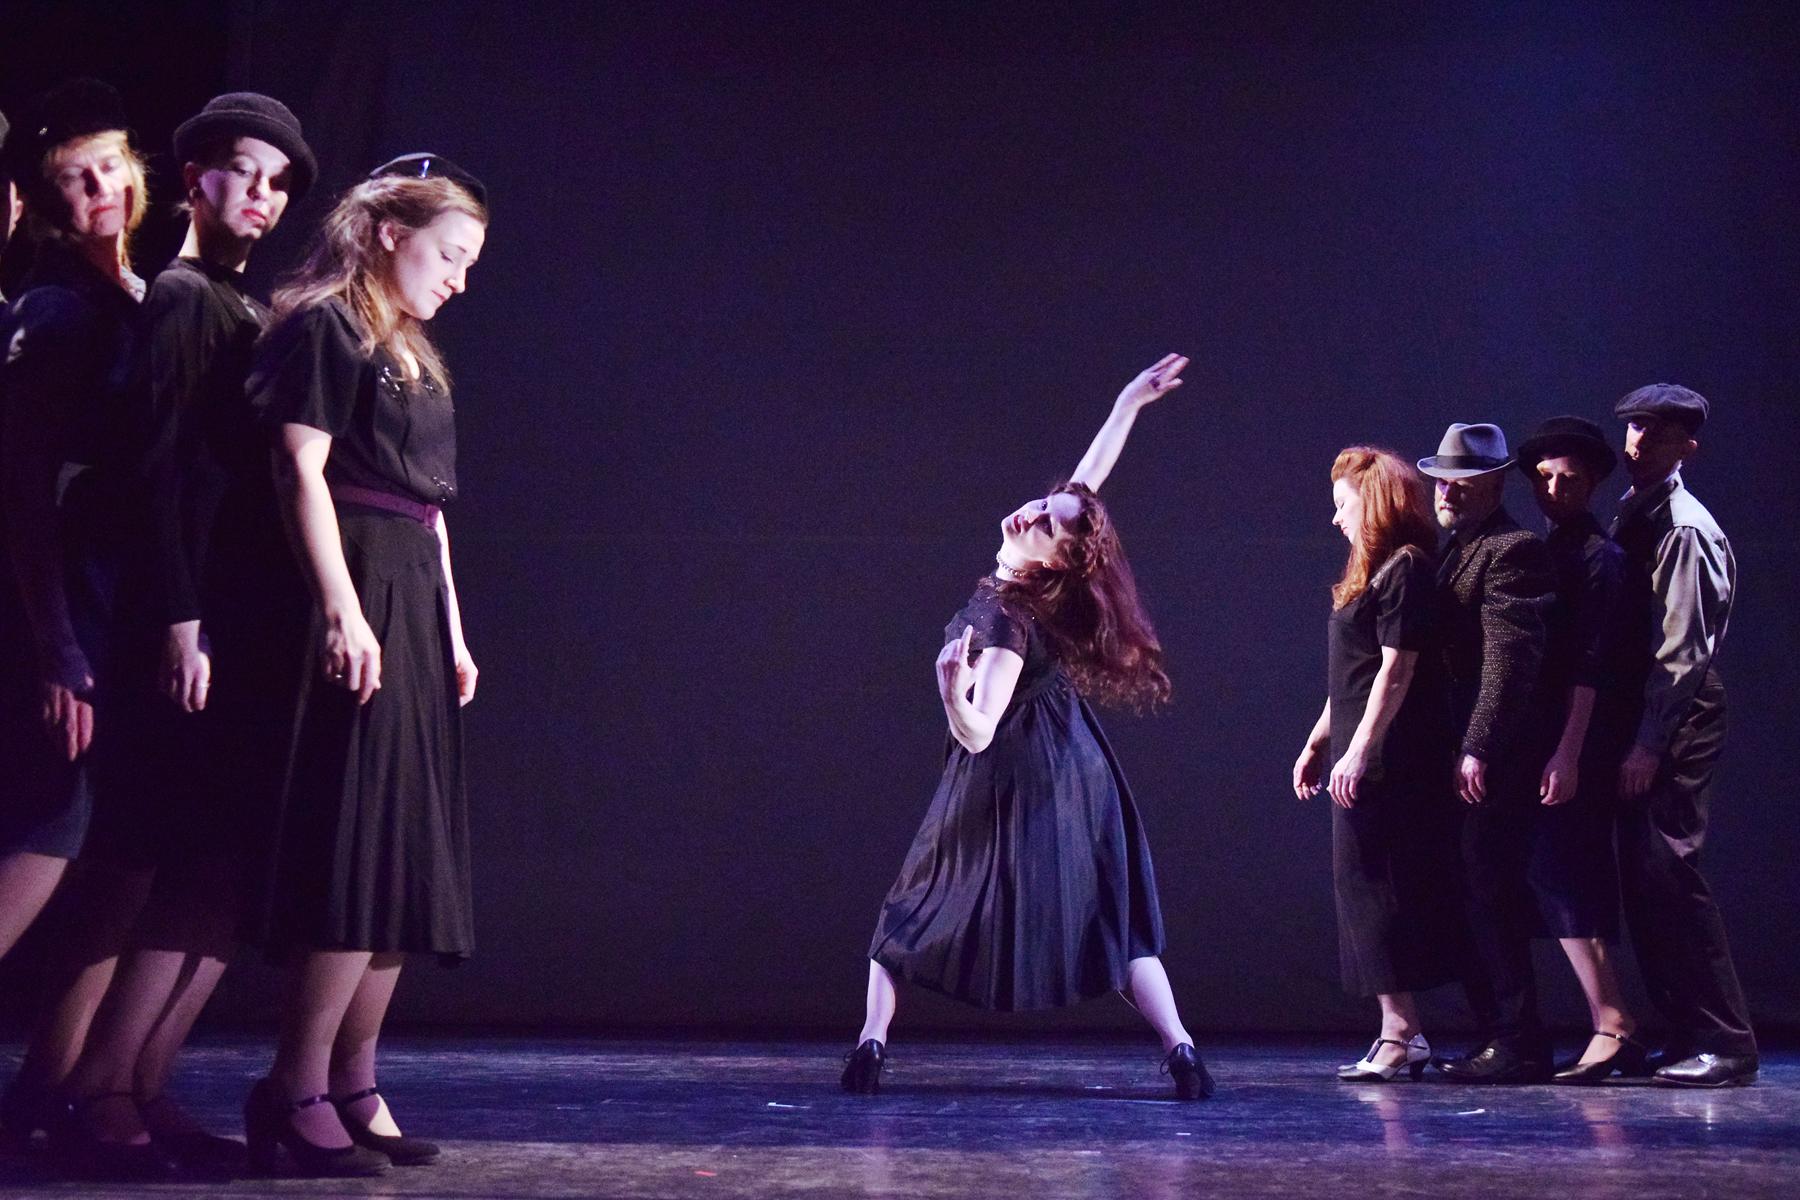 Matinee, Stuart Pimsler Dance & Theater